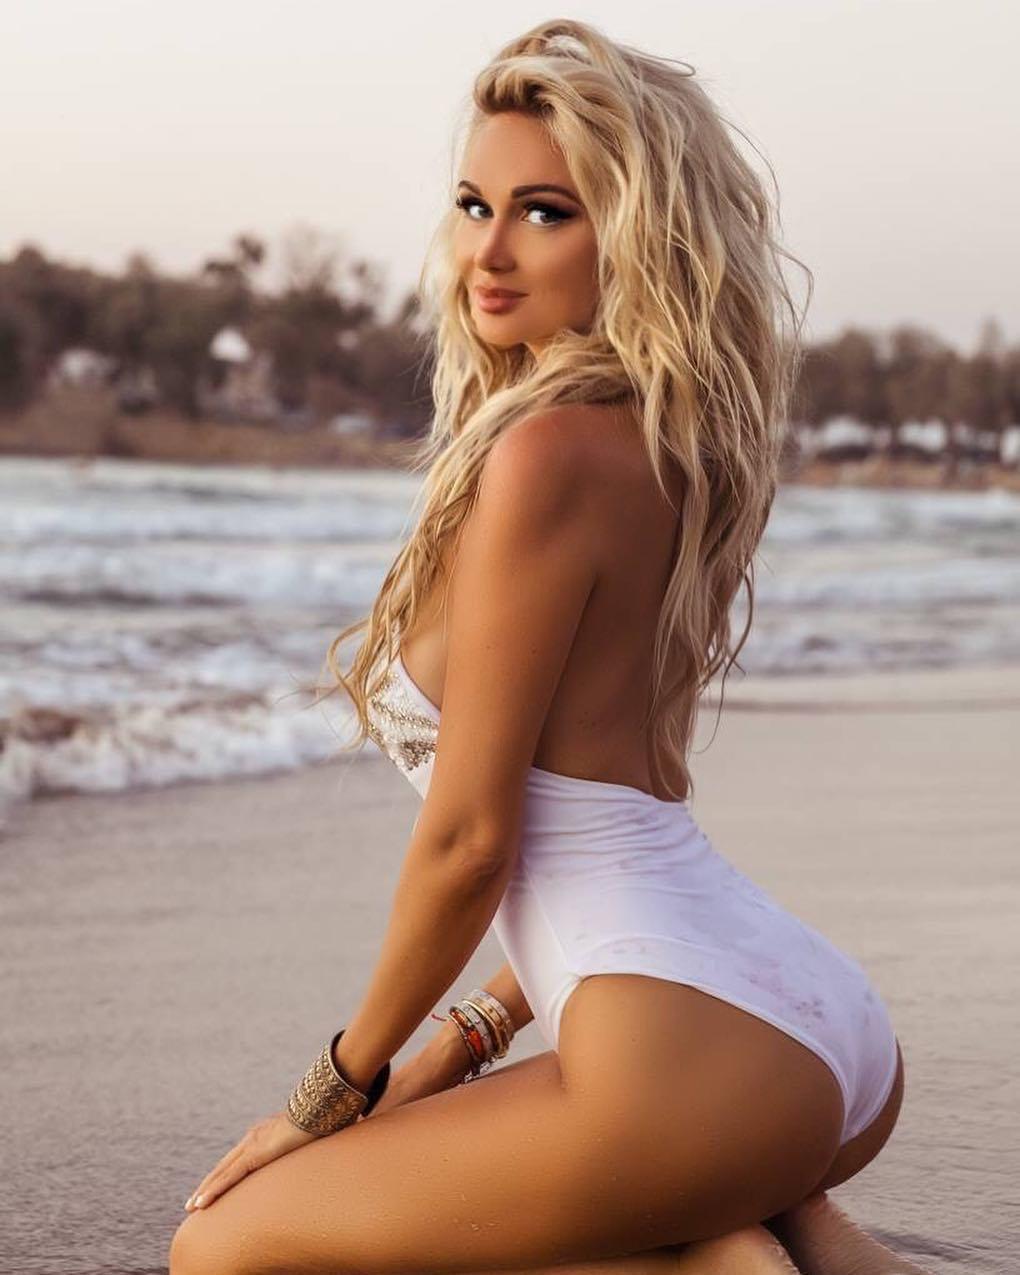 Victoria-Lopyreva-Fotograflari-2018-49